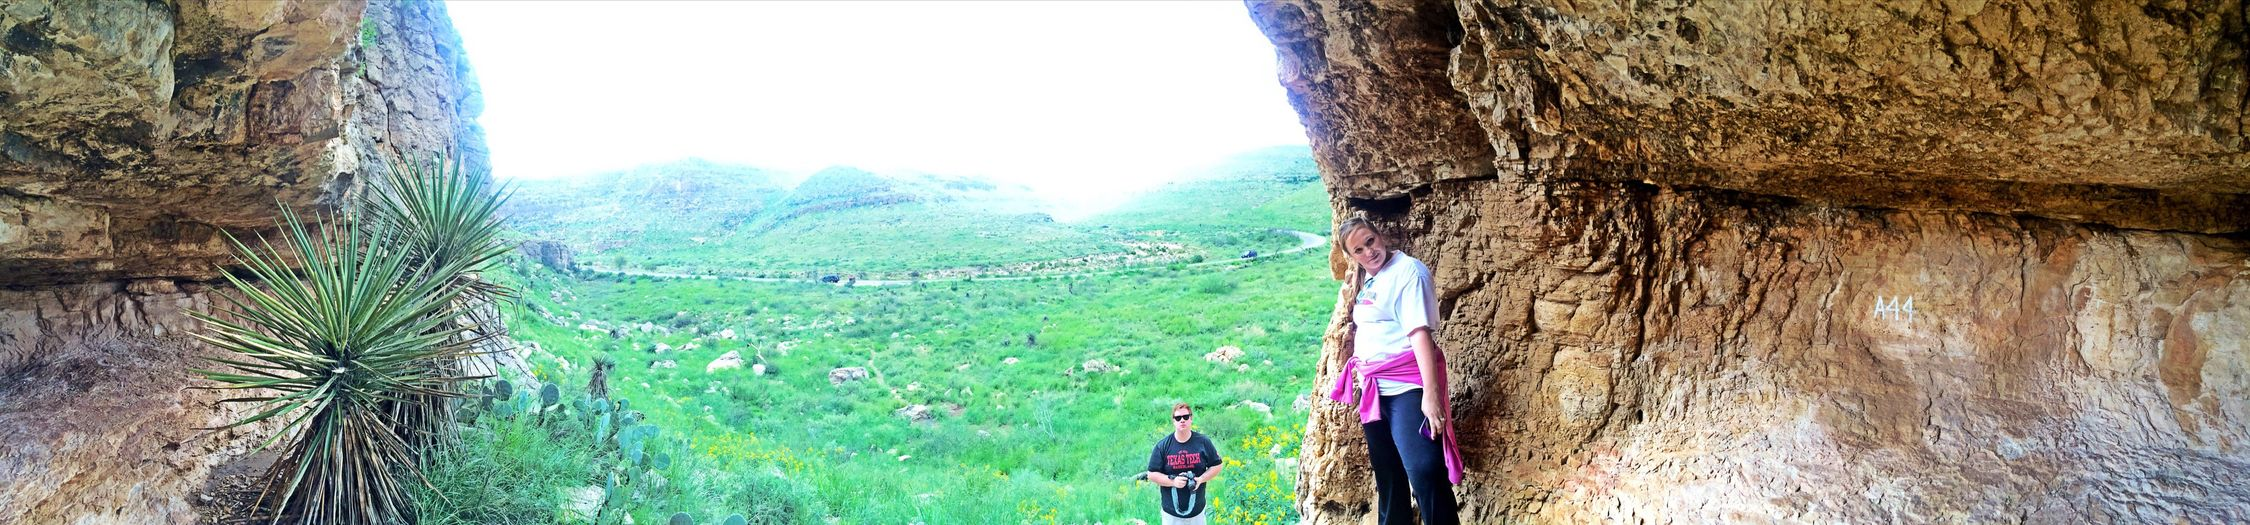 CarlsbadCaverns New Mexico Panorama Landscape